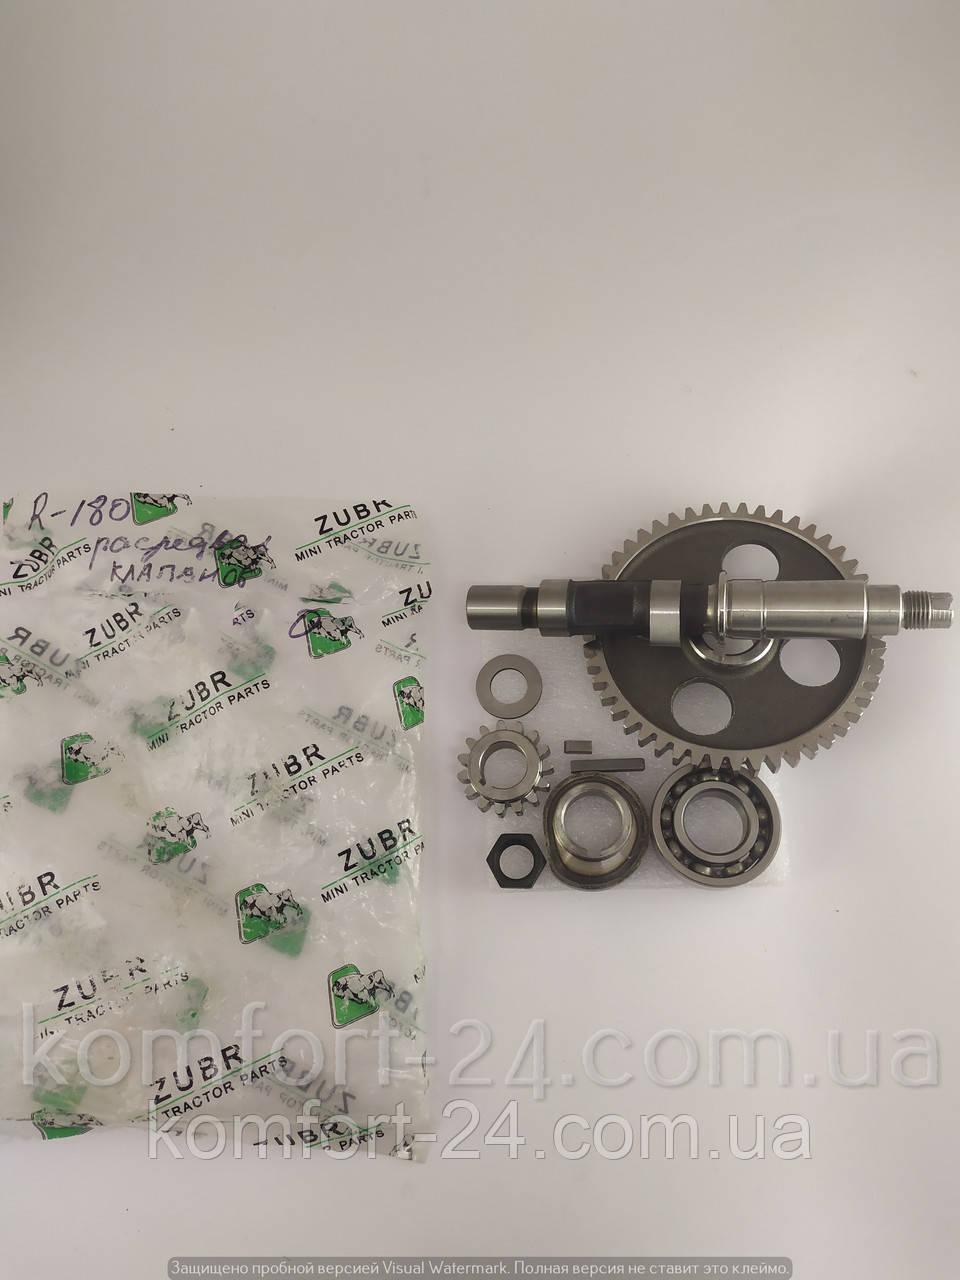 Распредвал клапанів двигуна R180 (Zubr)